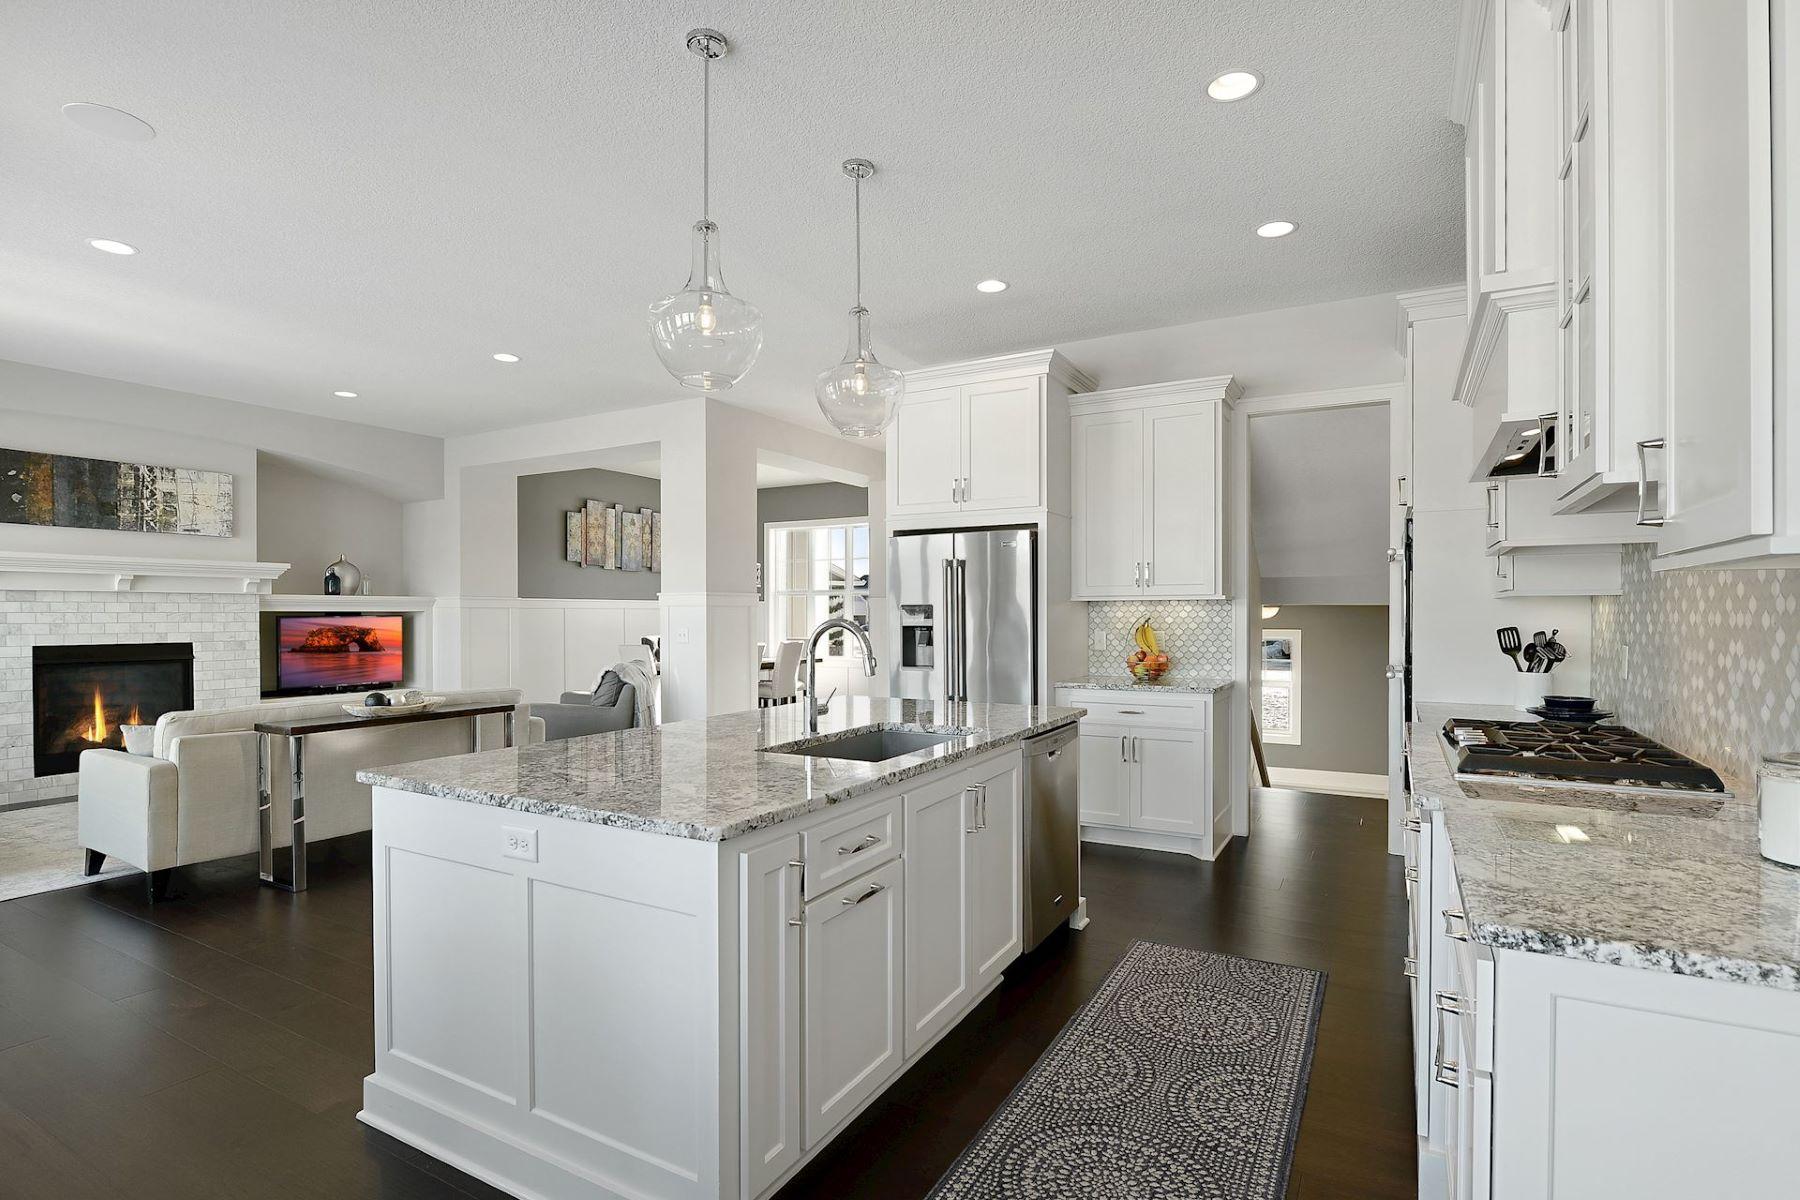 Additional photo for property listing at 3067 131st Court NE Blaine, Minnesota 55449 United States